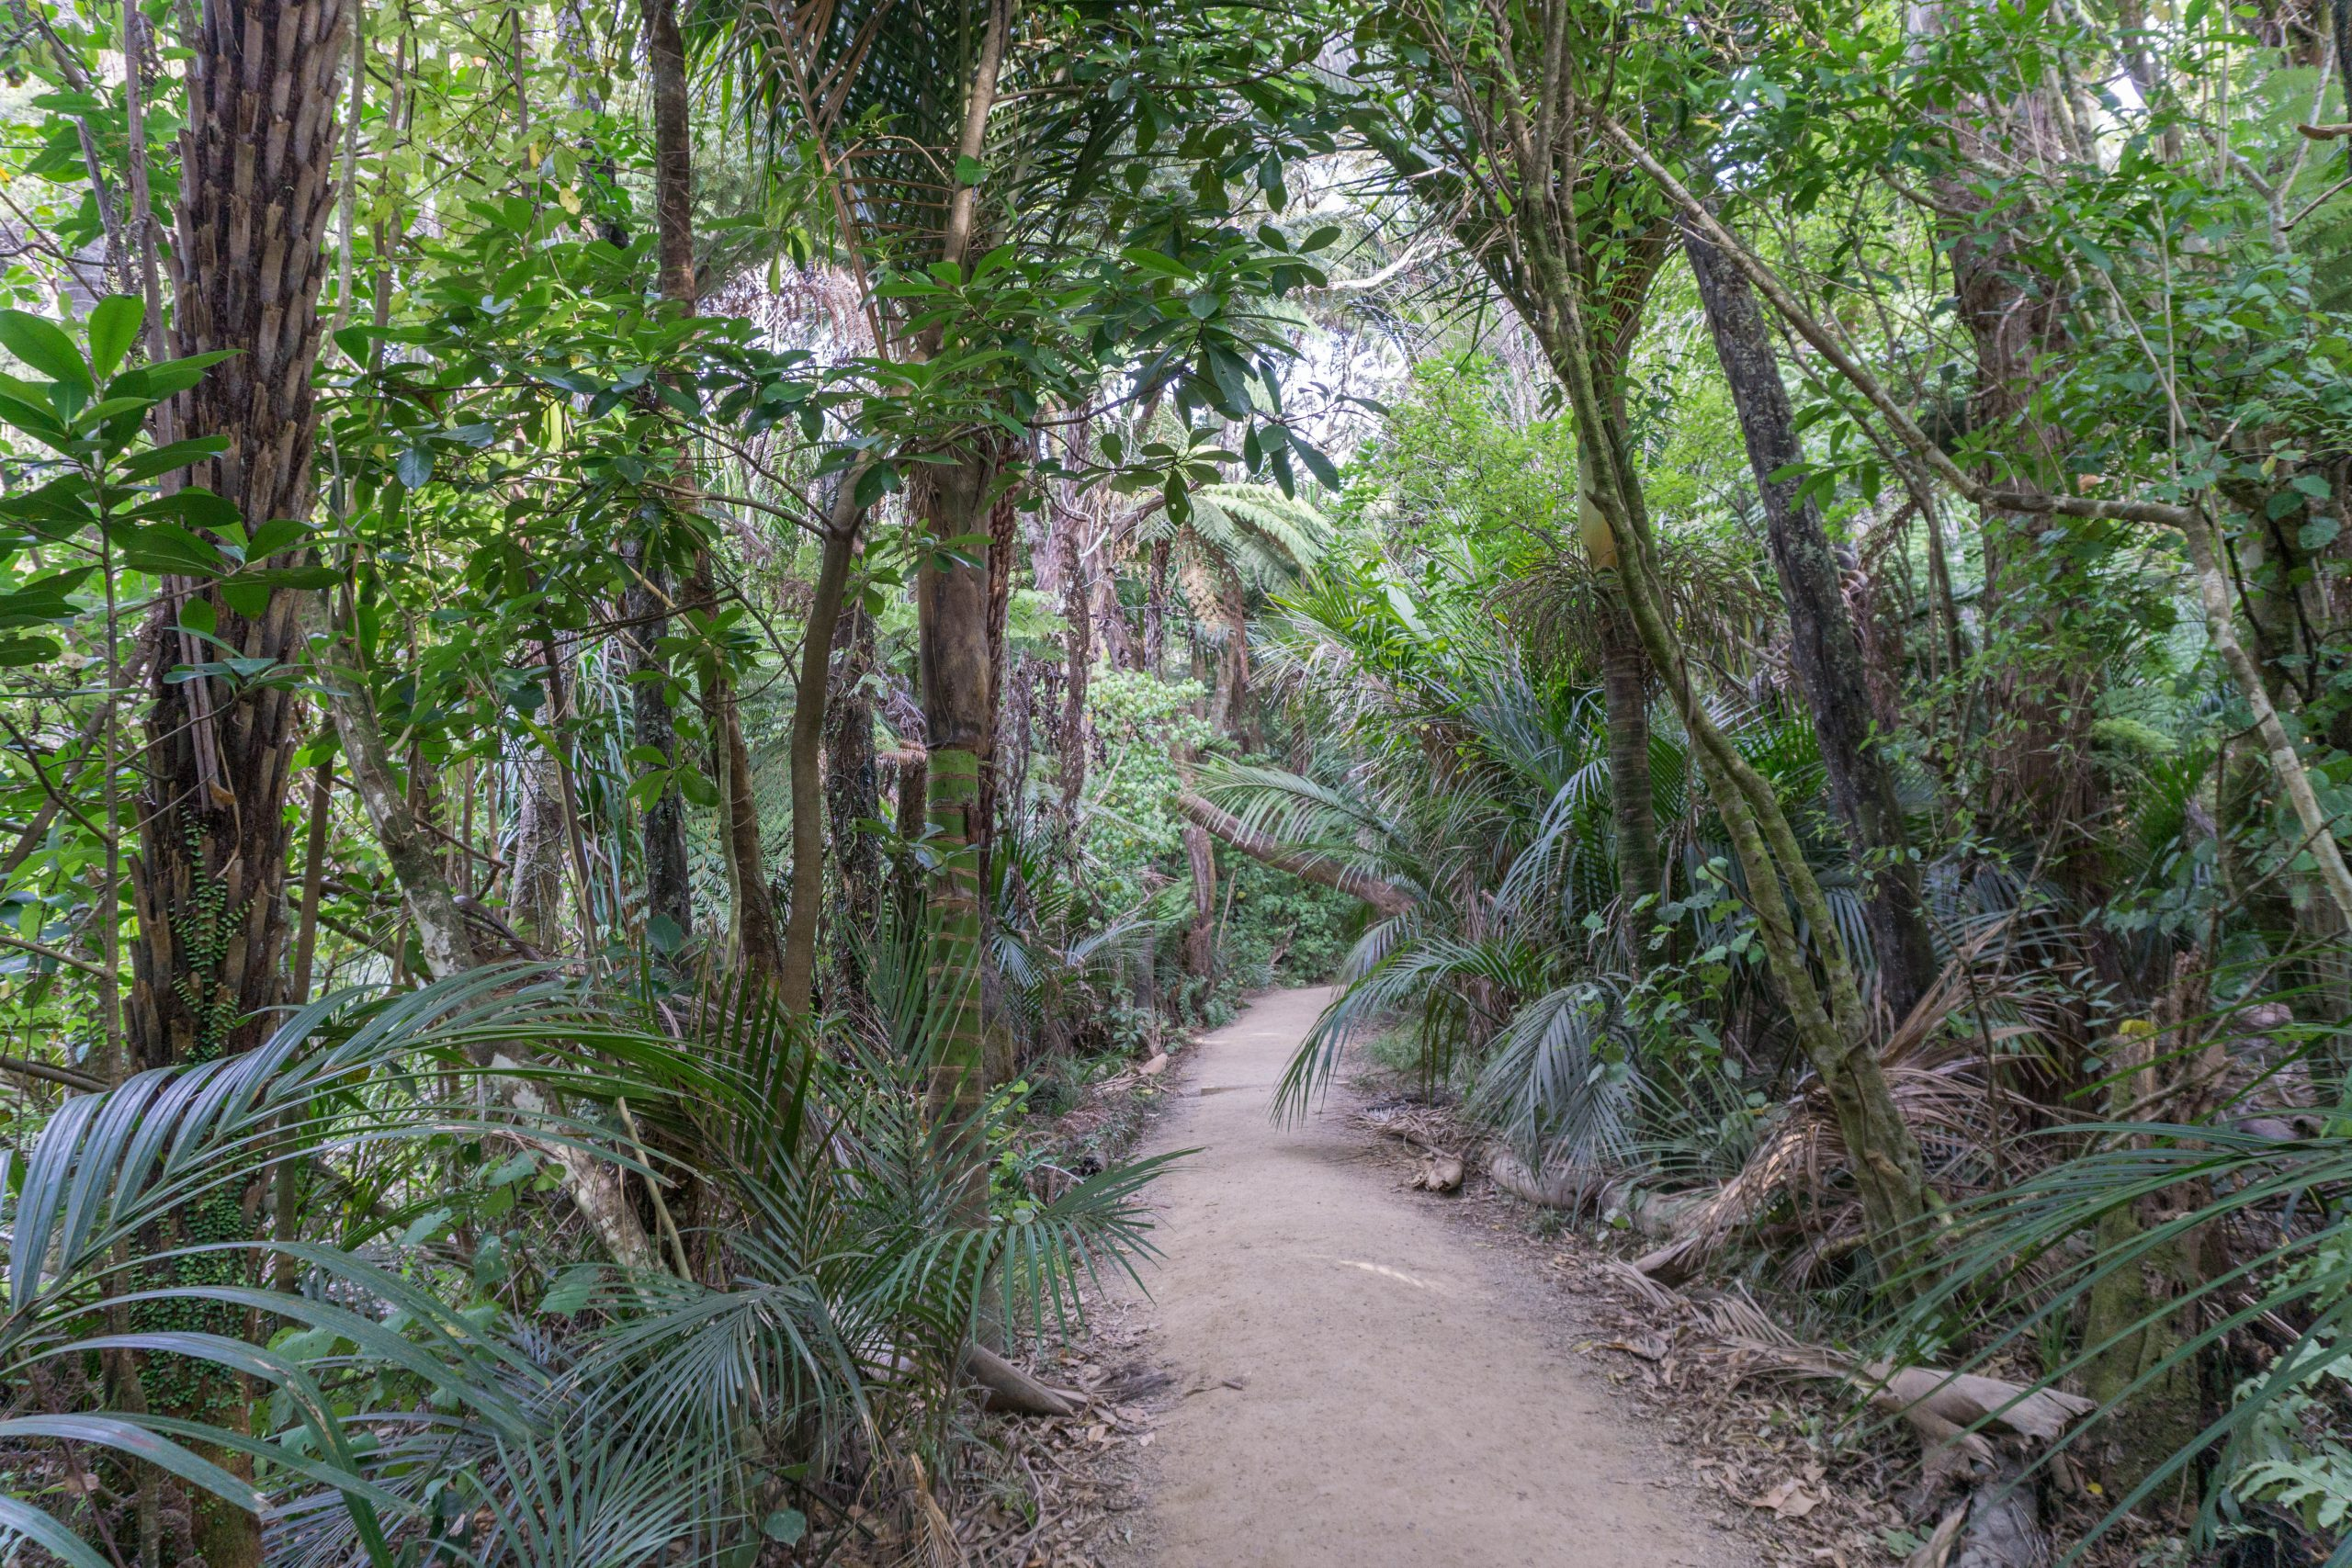 Kitekite-Falls-greenery-and-path